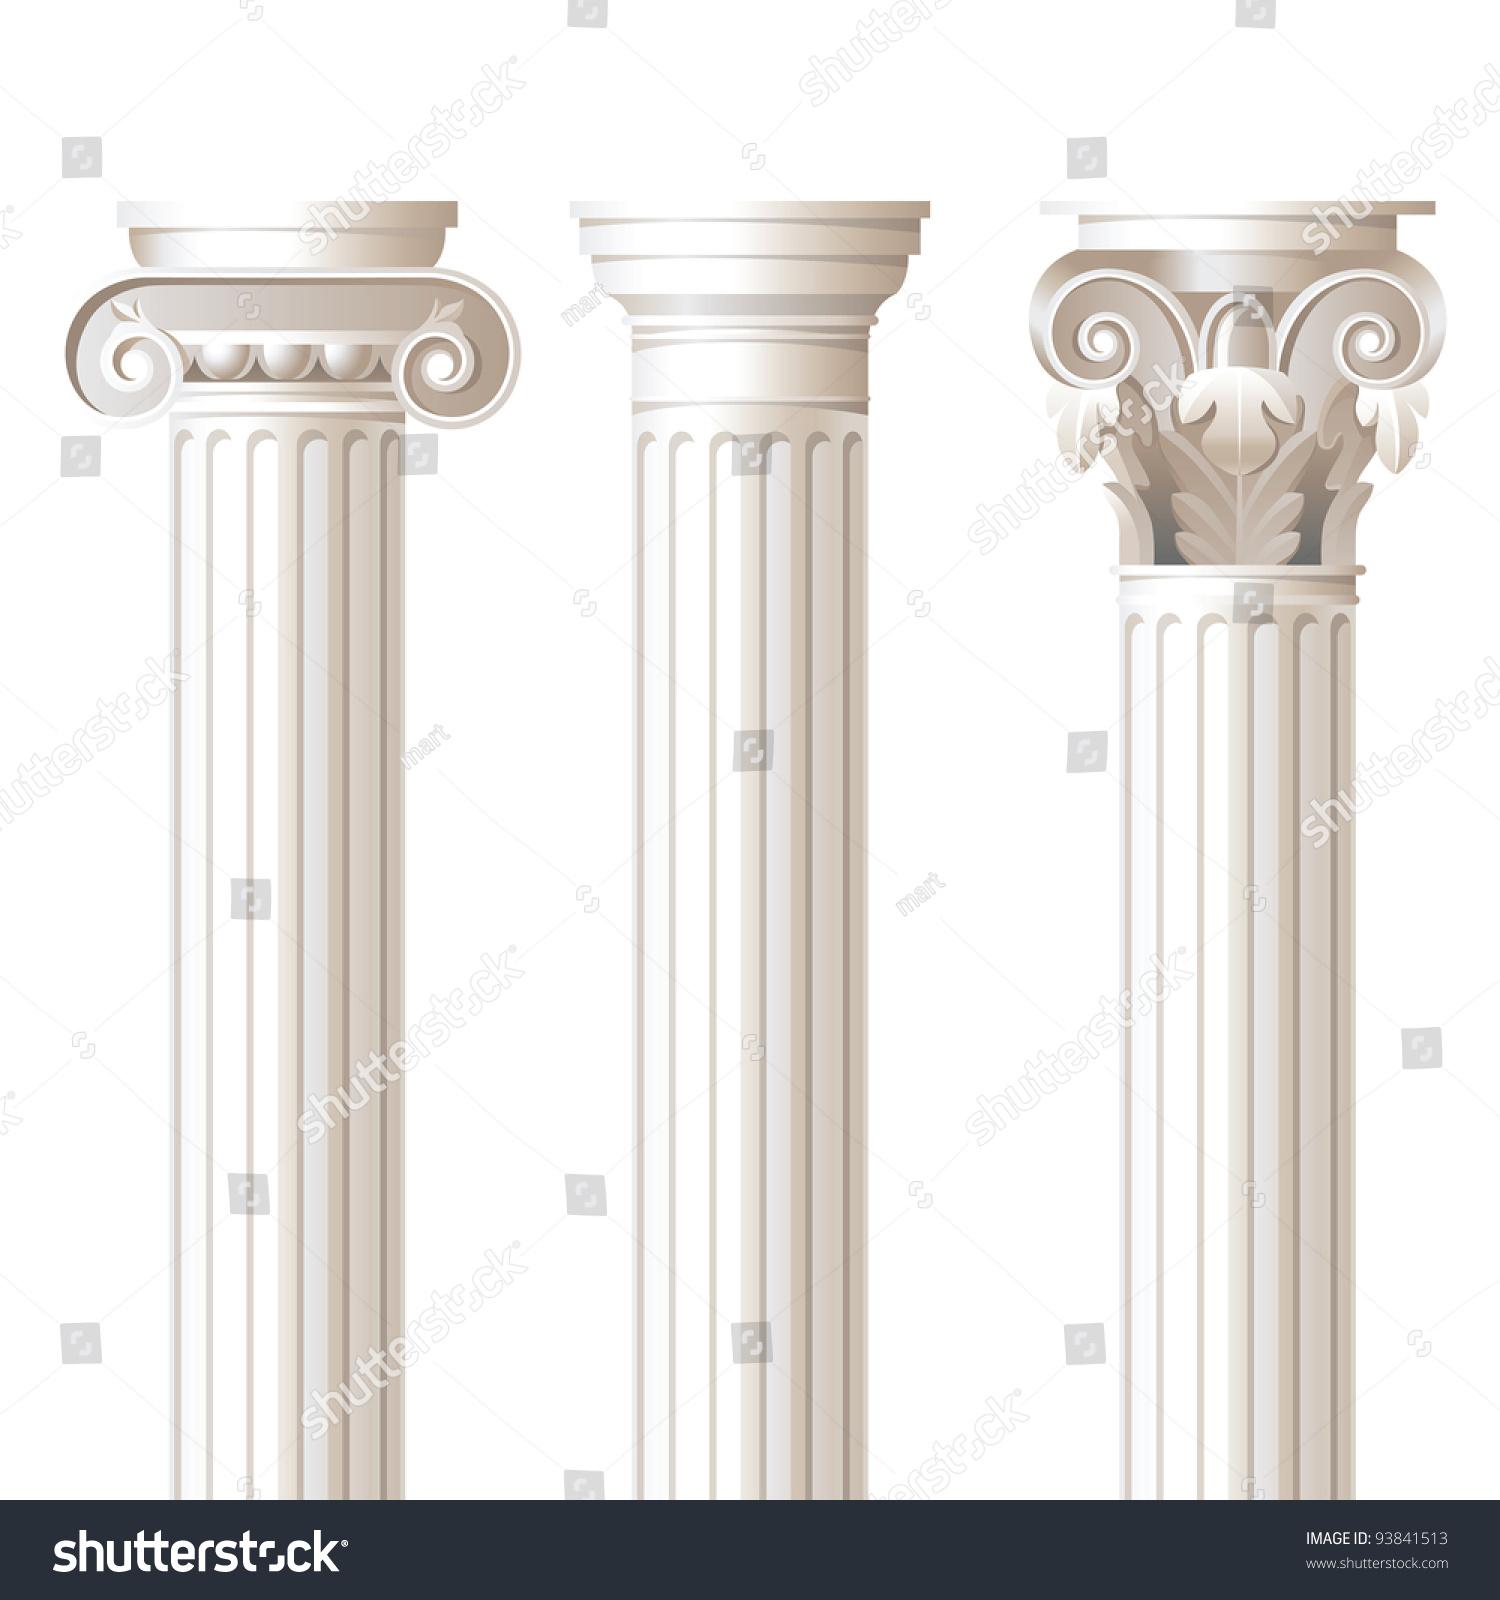 3 Columns Different Styles Ionic Doric Stock Vector